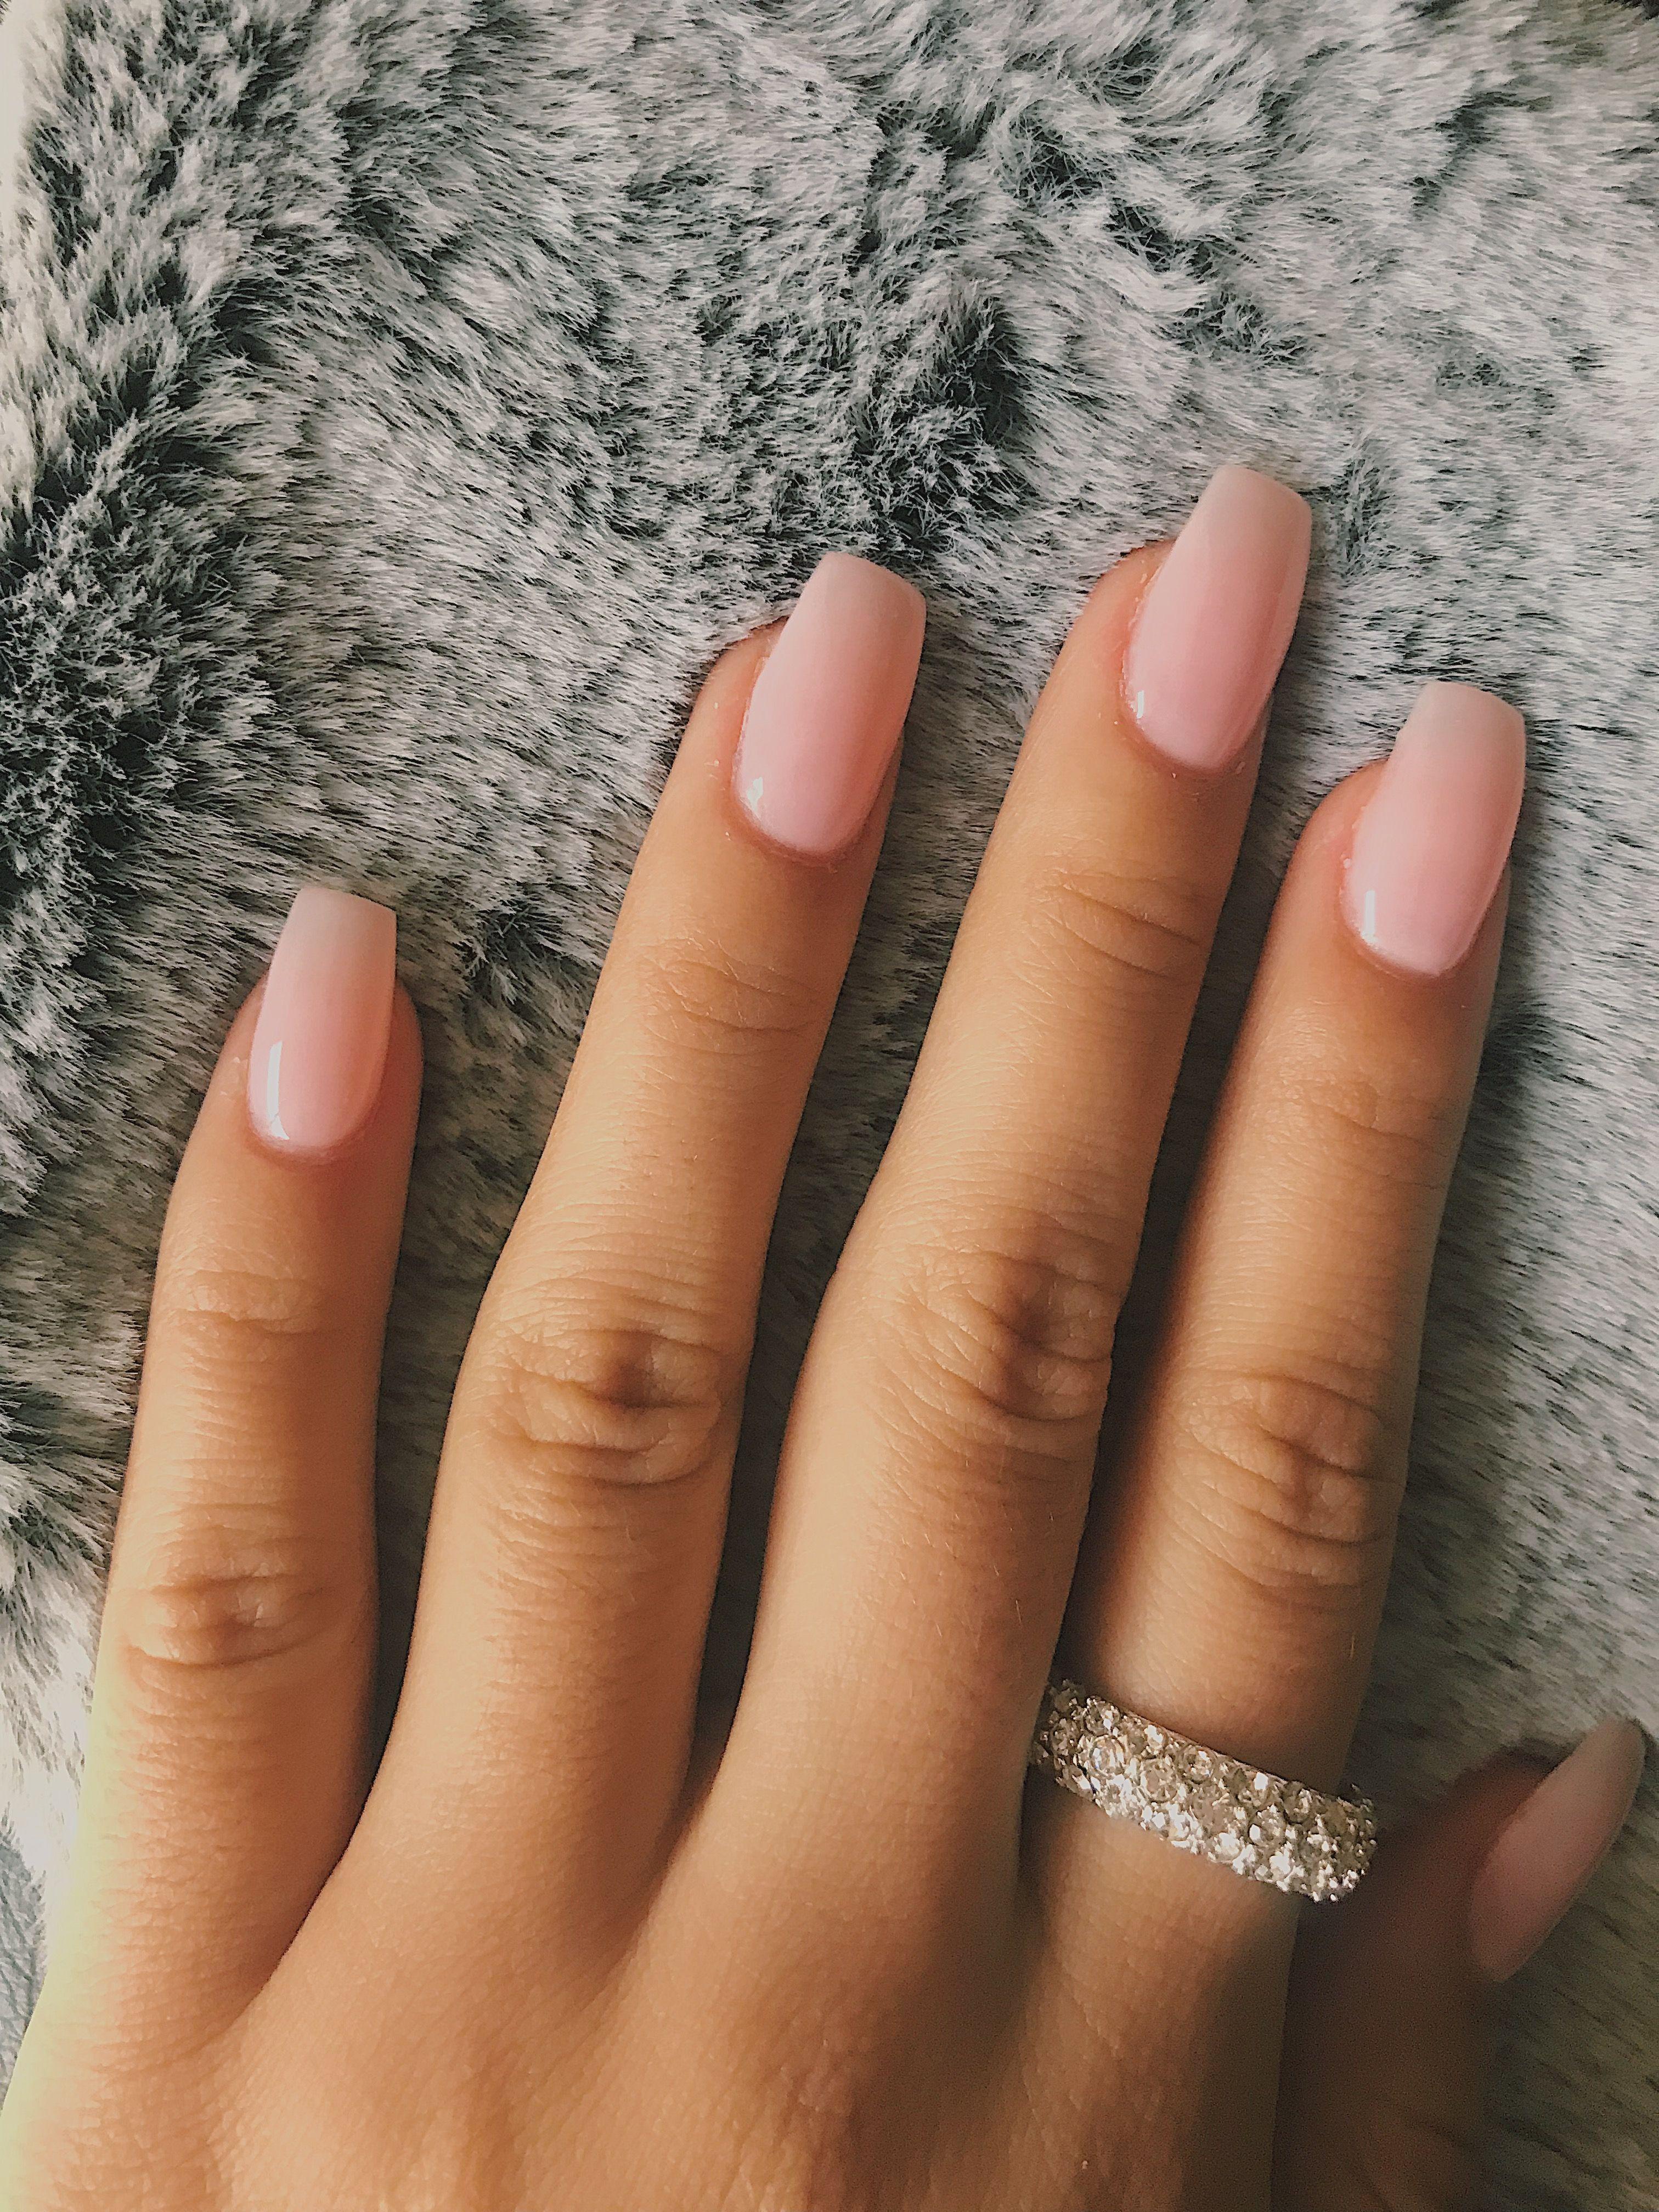 nail ideas to go with red dress - Nail Ideas #dress #Nail